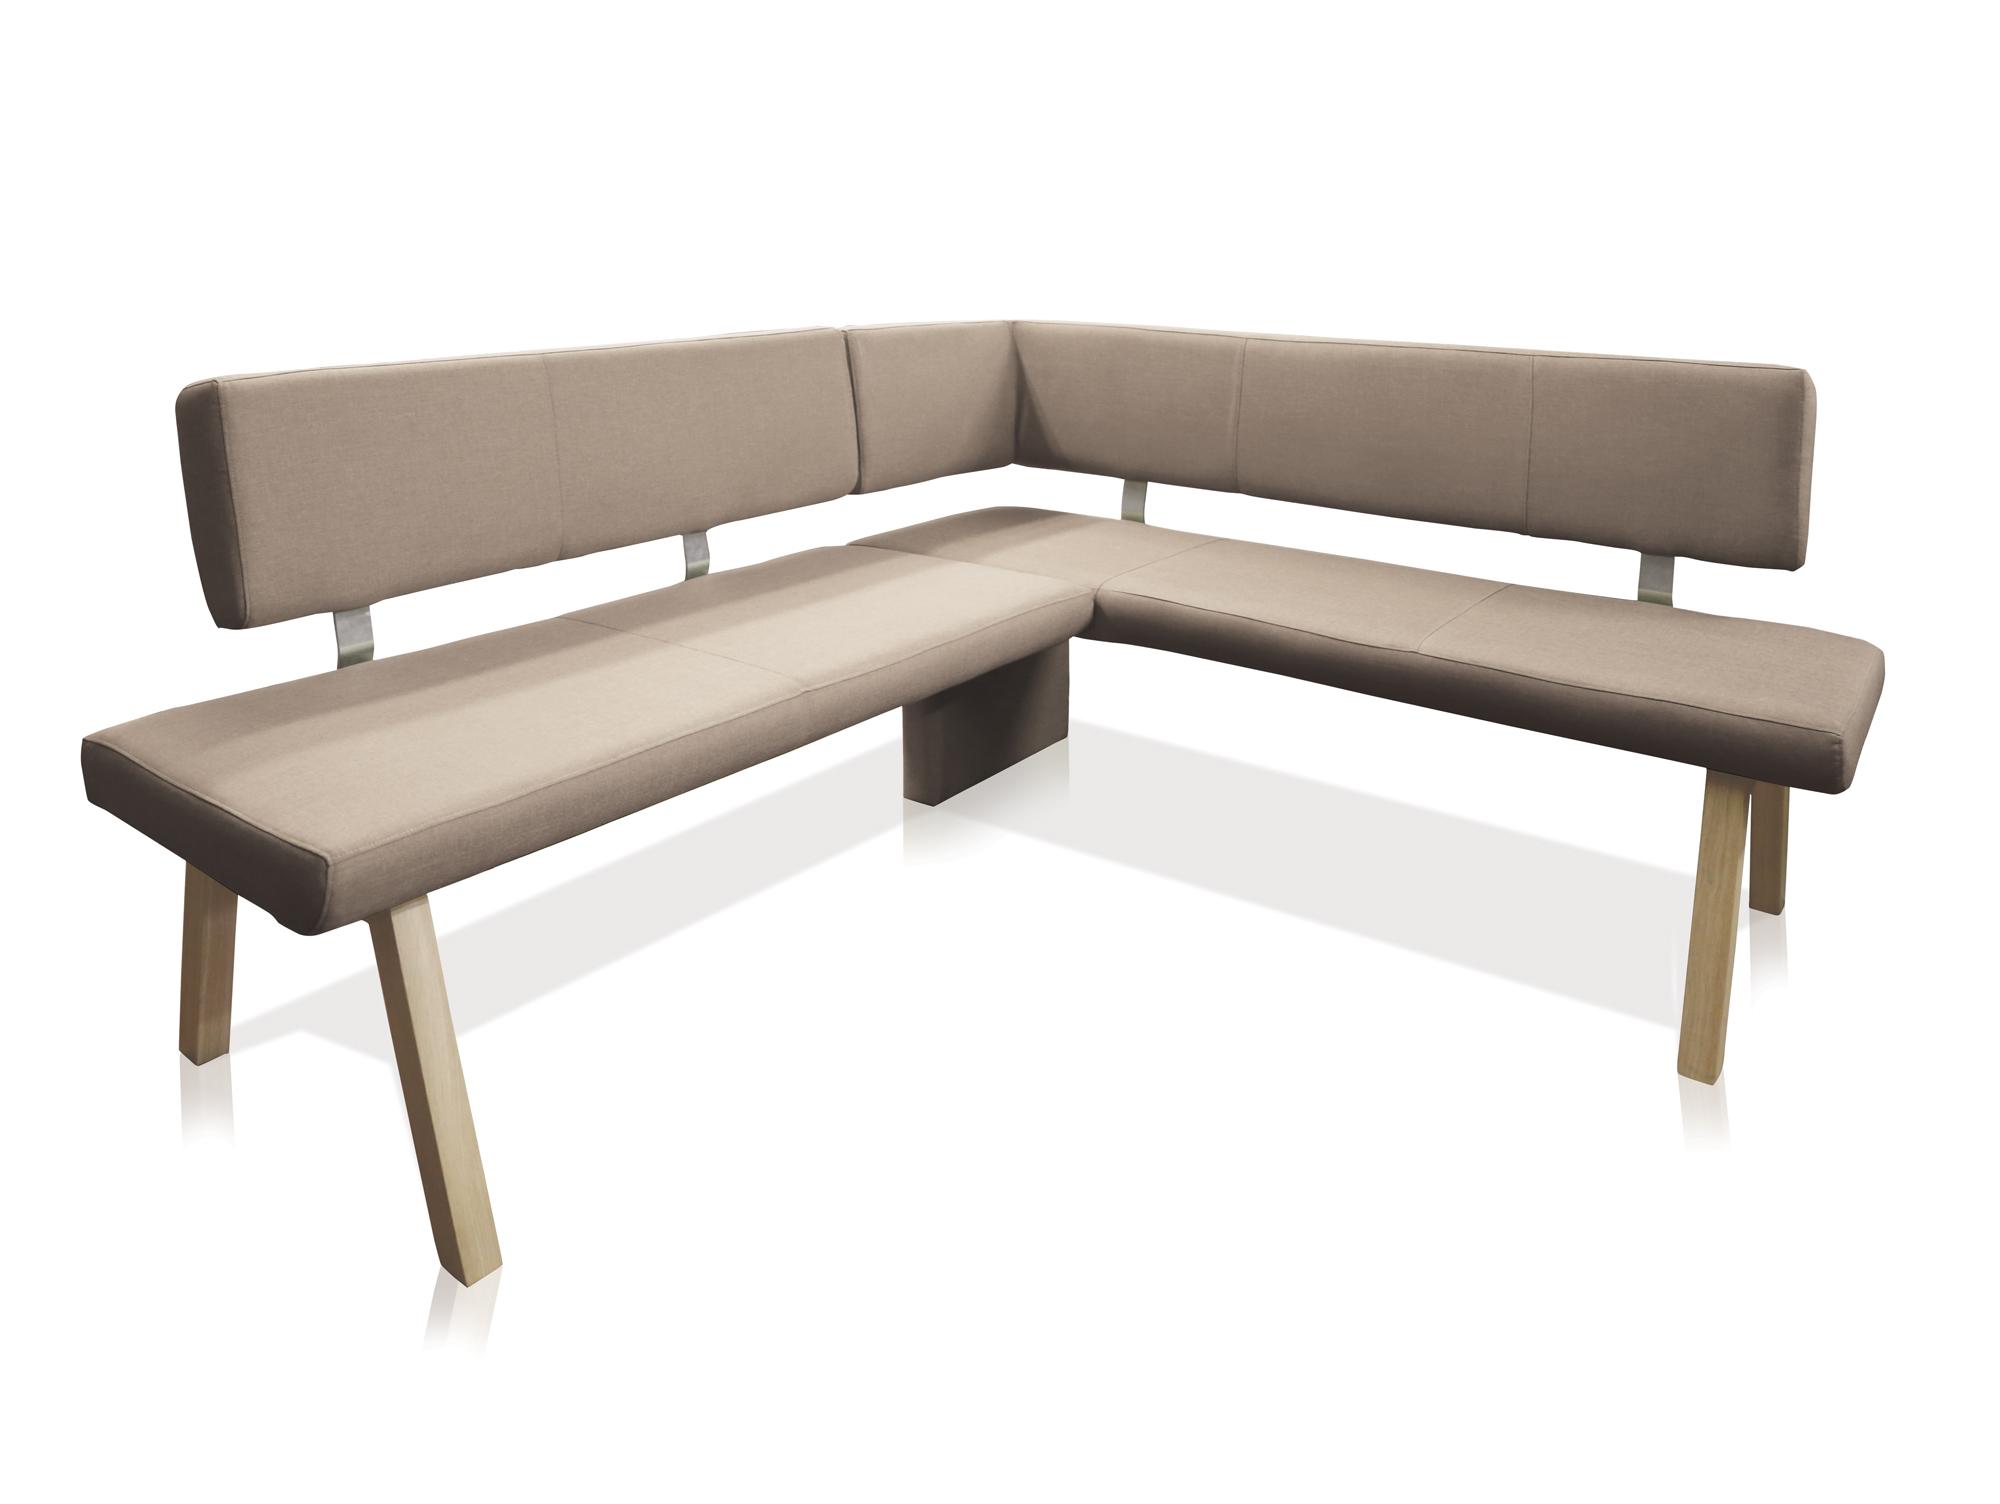 koby eckbank mit stoffbezug taupe rechts 192 x 161 cm. Black Bedroom Furniture Sets. Home Design Ideas